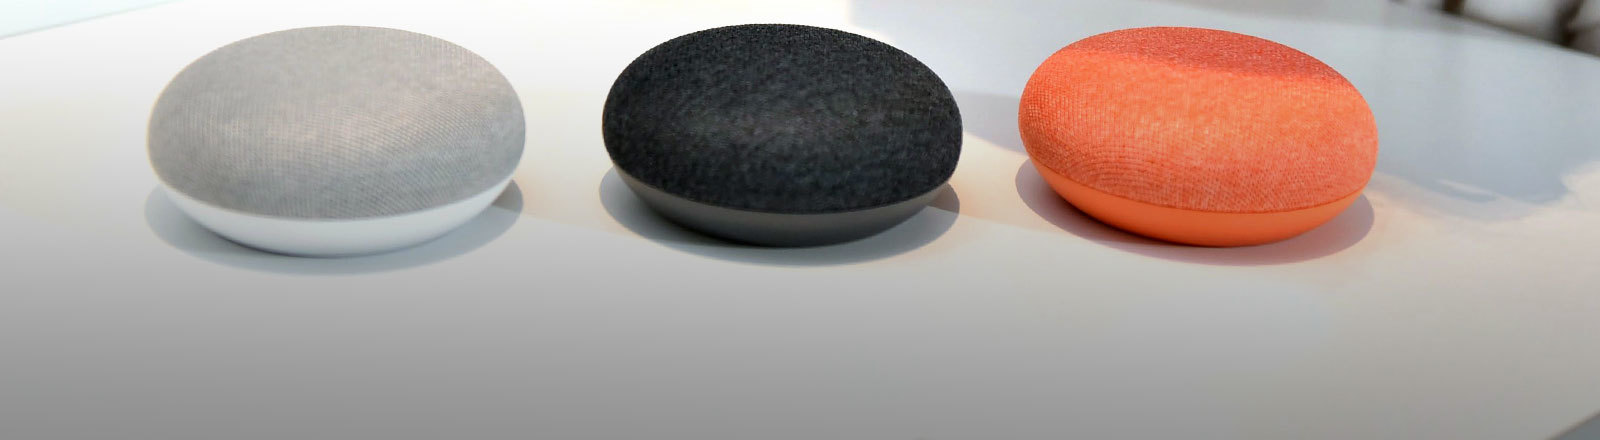 Das neue Assistenzsystem Google Home Mini